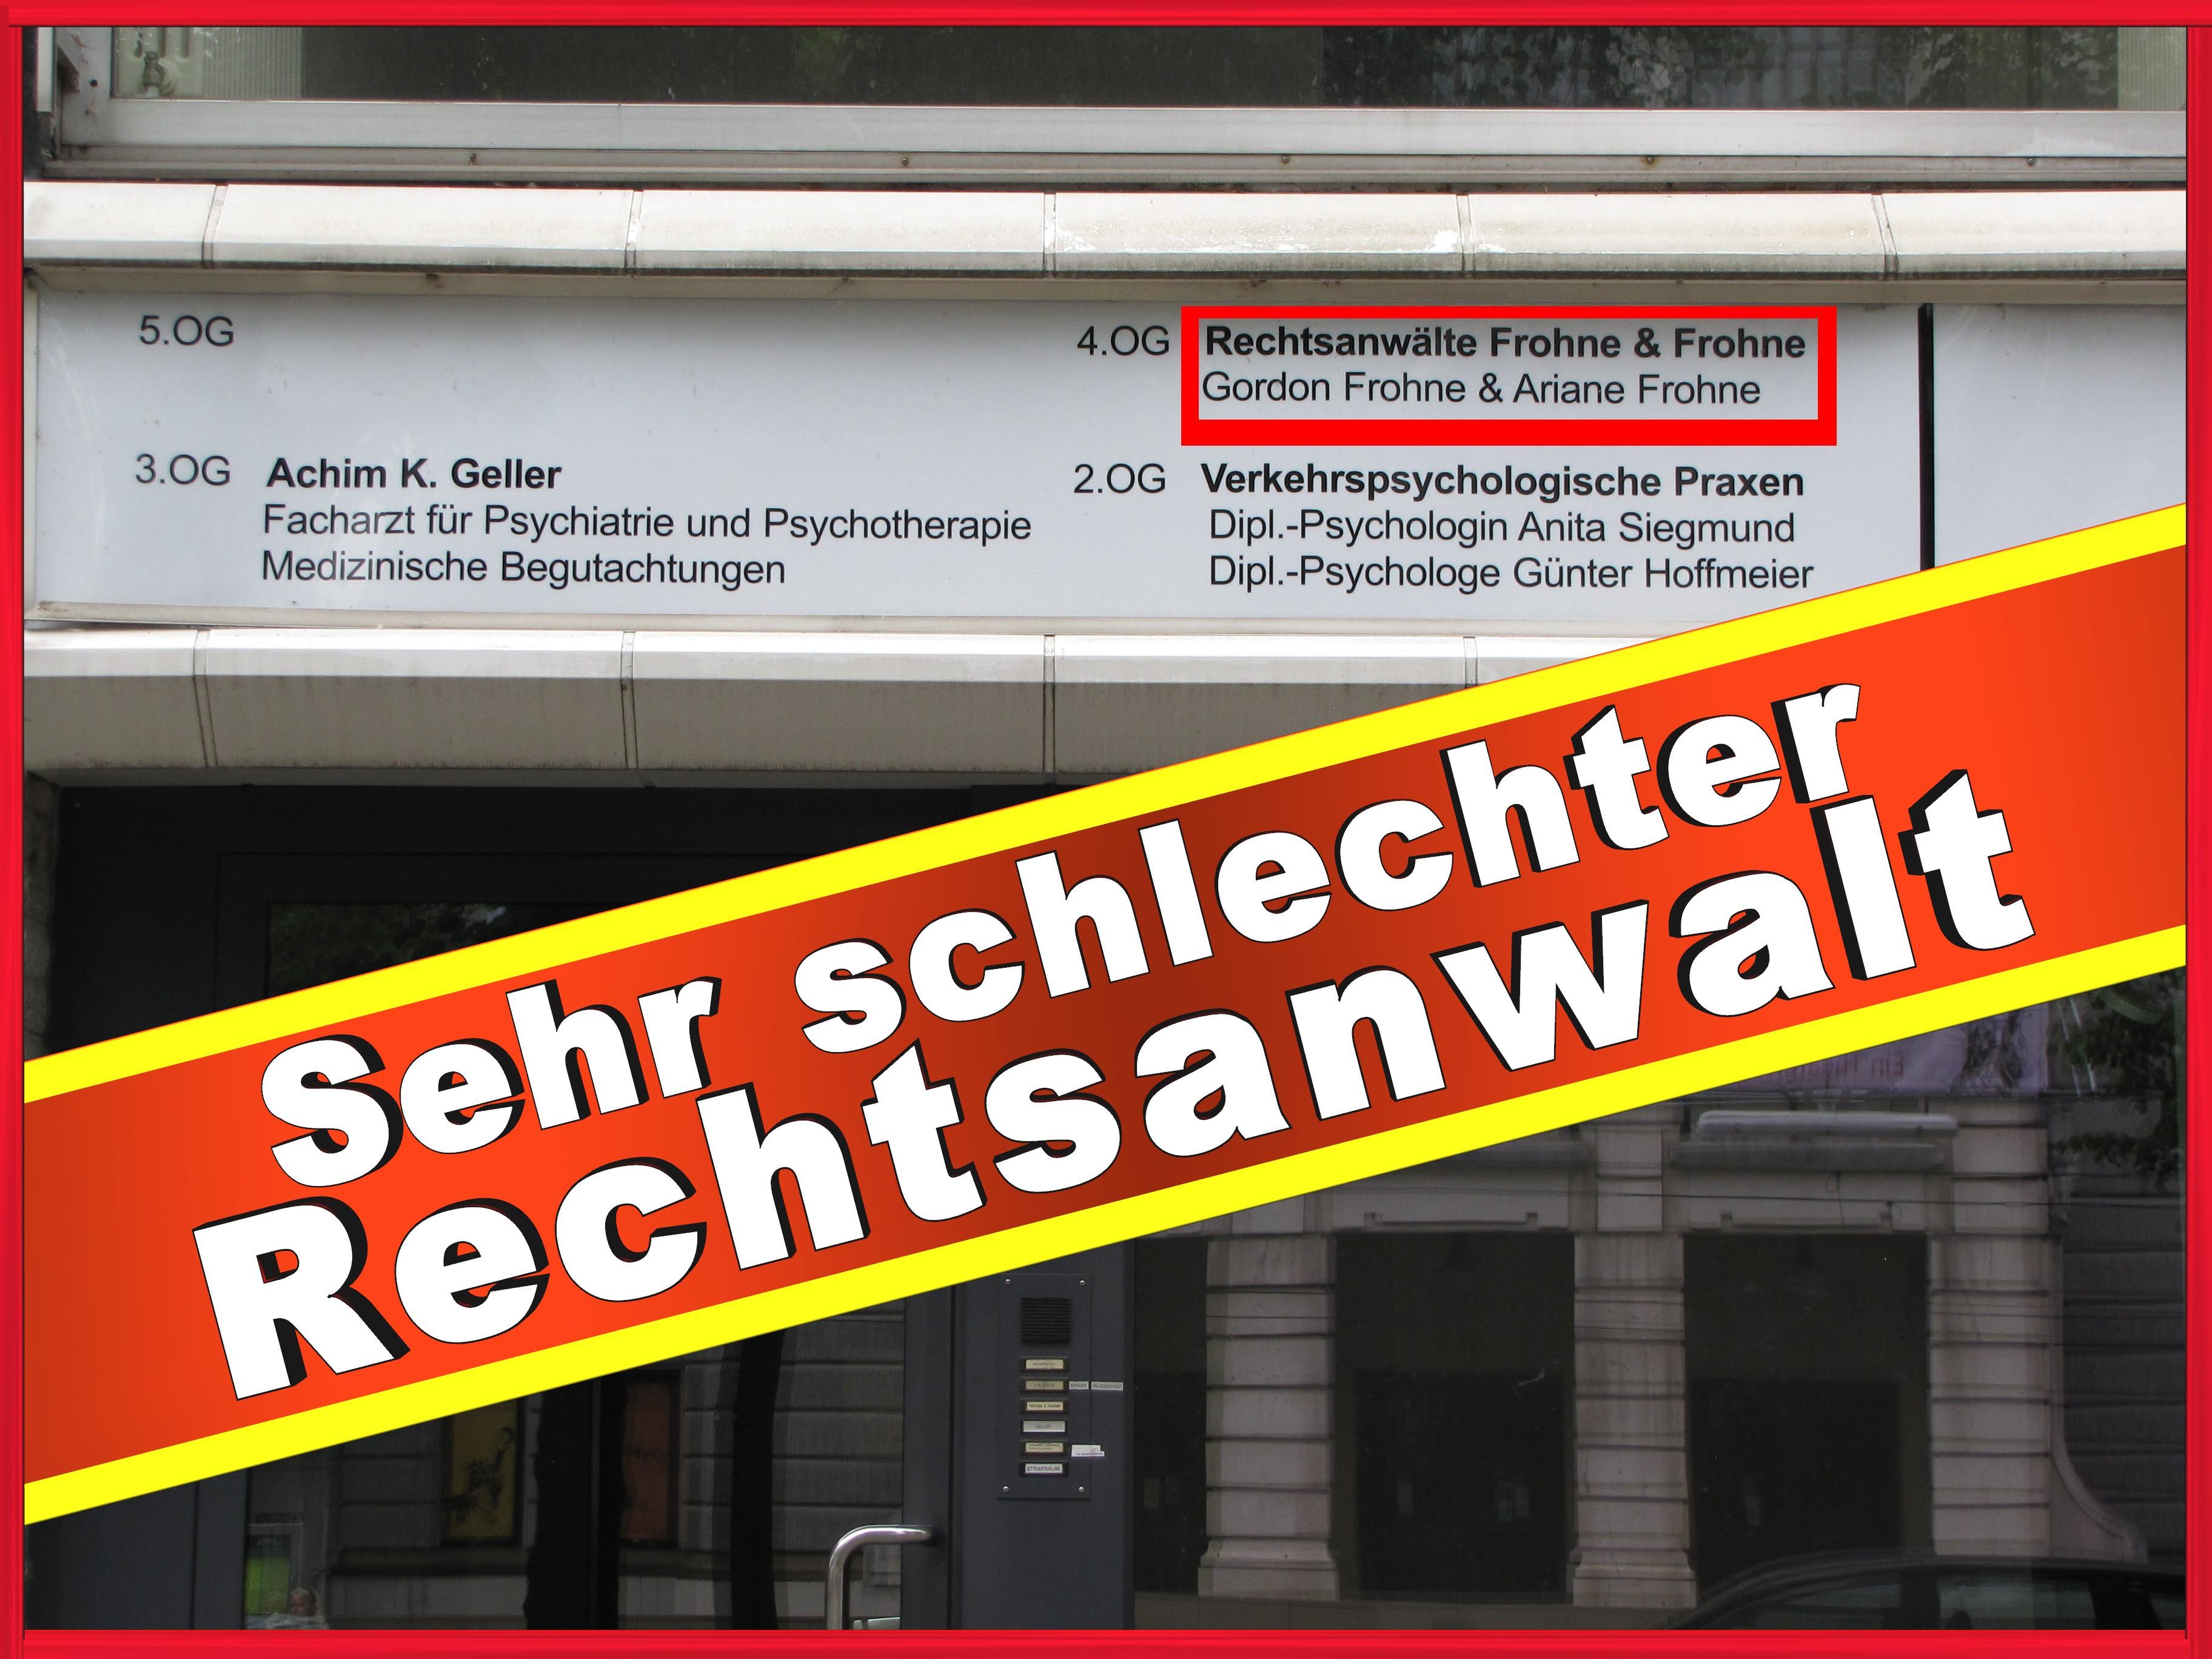 Rechtsanwalt Gordon Frohne Niederwall 18 Bielefeld Ariane Frohne Gordon Frohne Ariane Frohne Dr. jur. Michael Schmitz